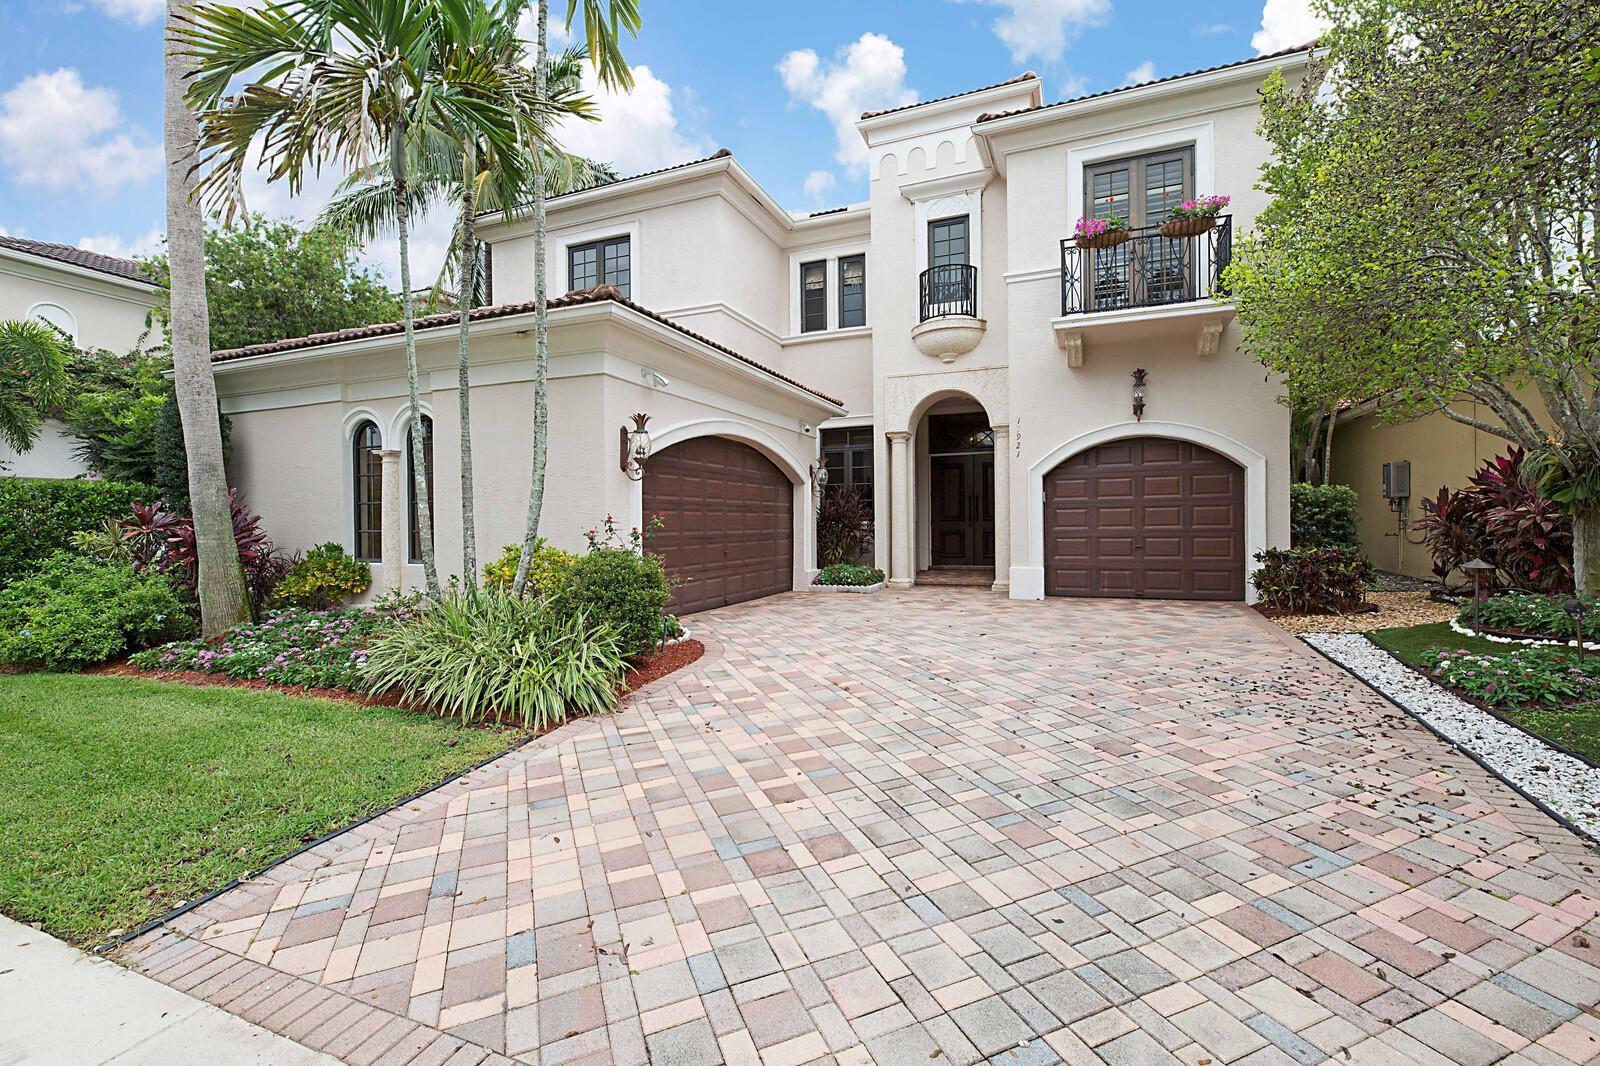 17921 Villa Club Way, Boca Raton, FL 33496 - #: RX-10731583